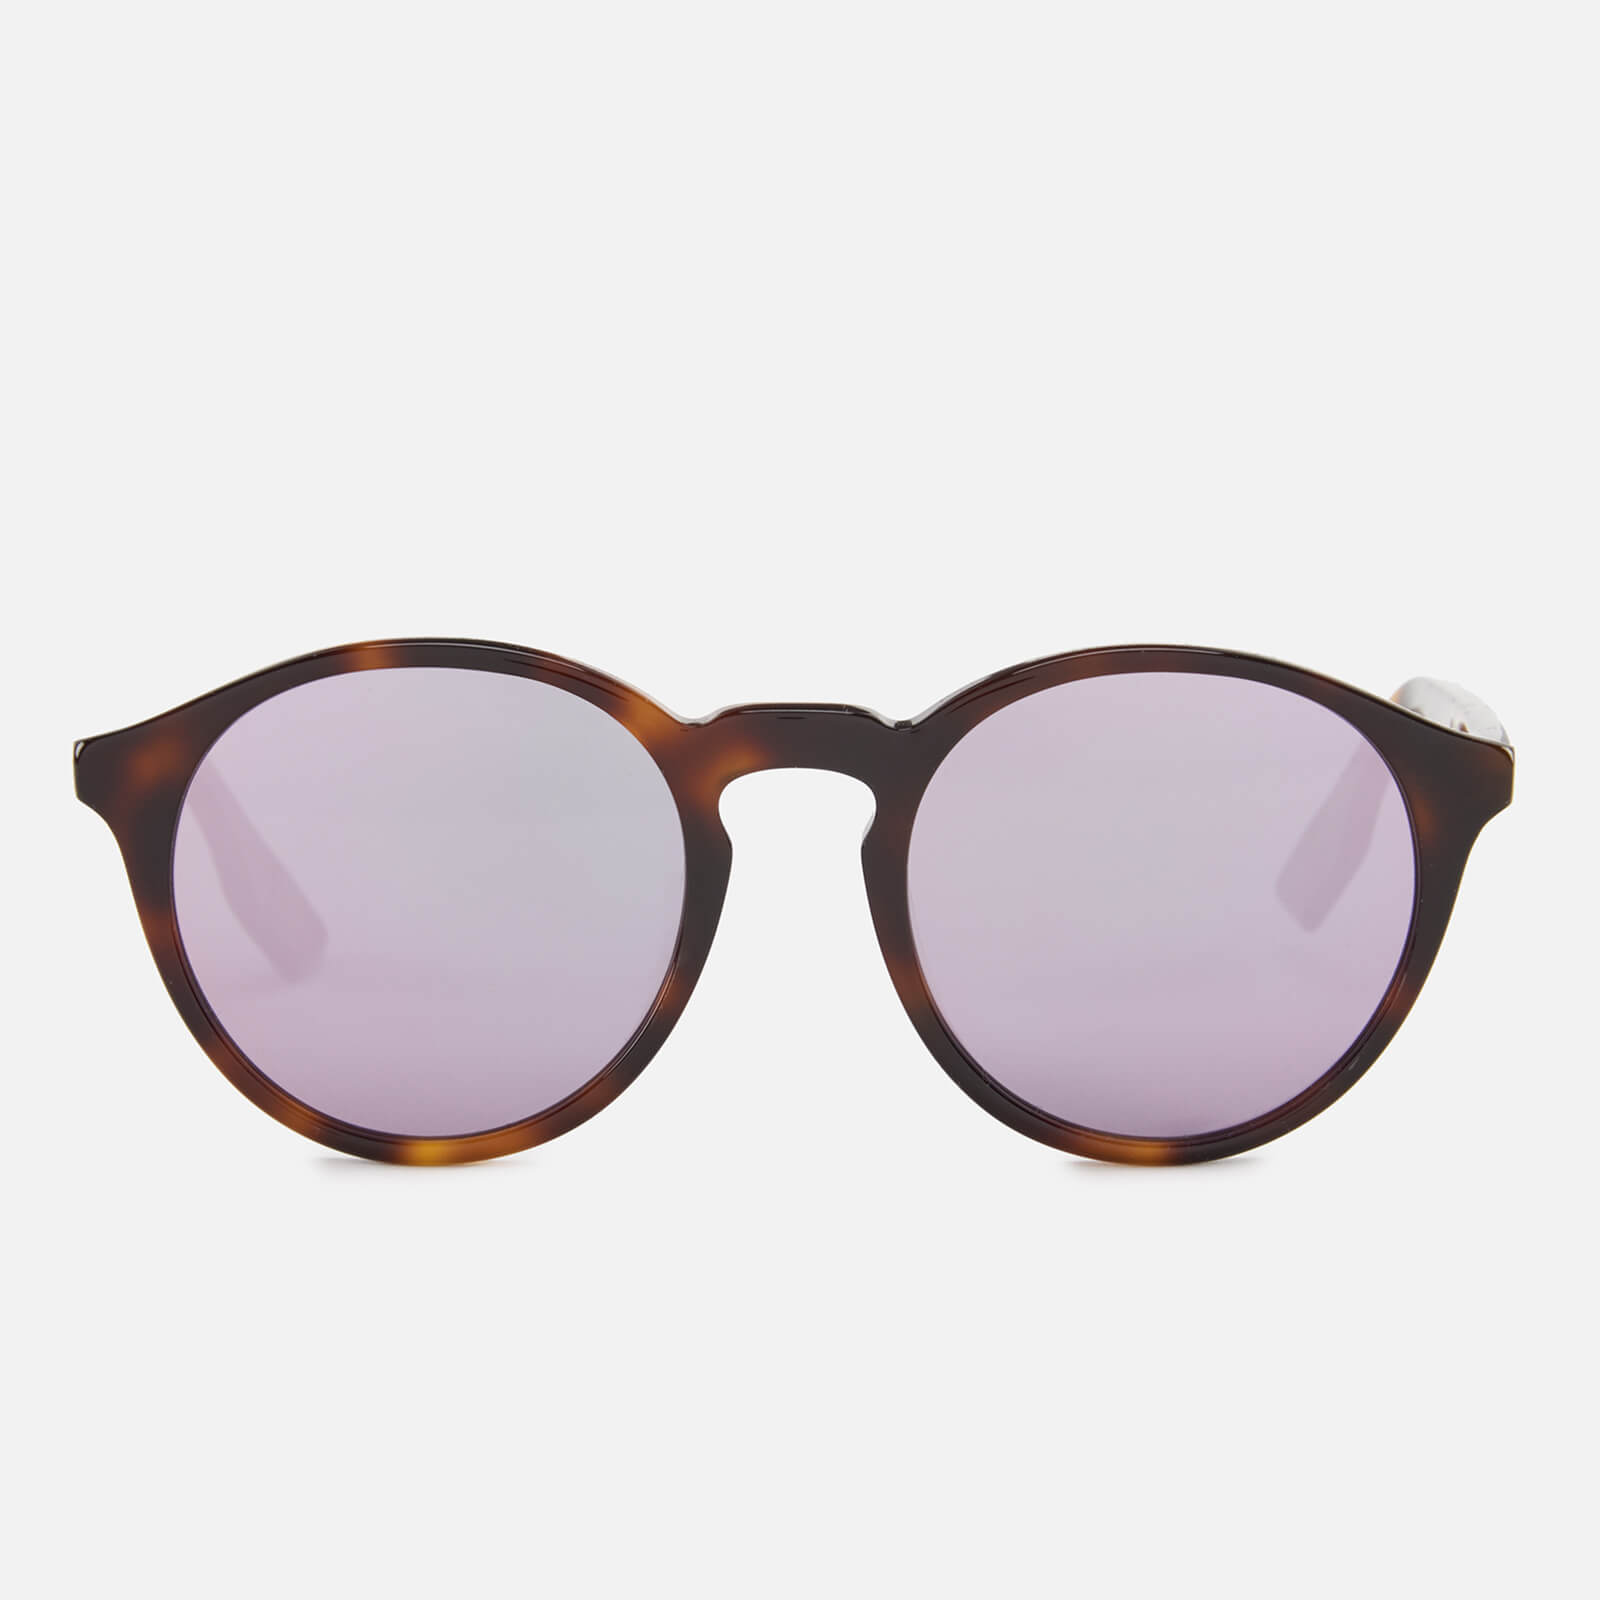 e6947080210b1 McQ Alexander McQueen Round Lens Sunglasses - Havana Pink - Free UK ...